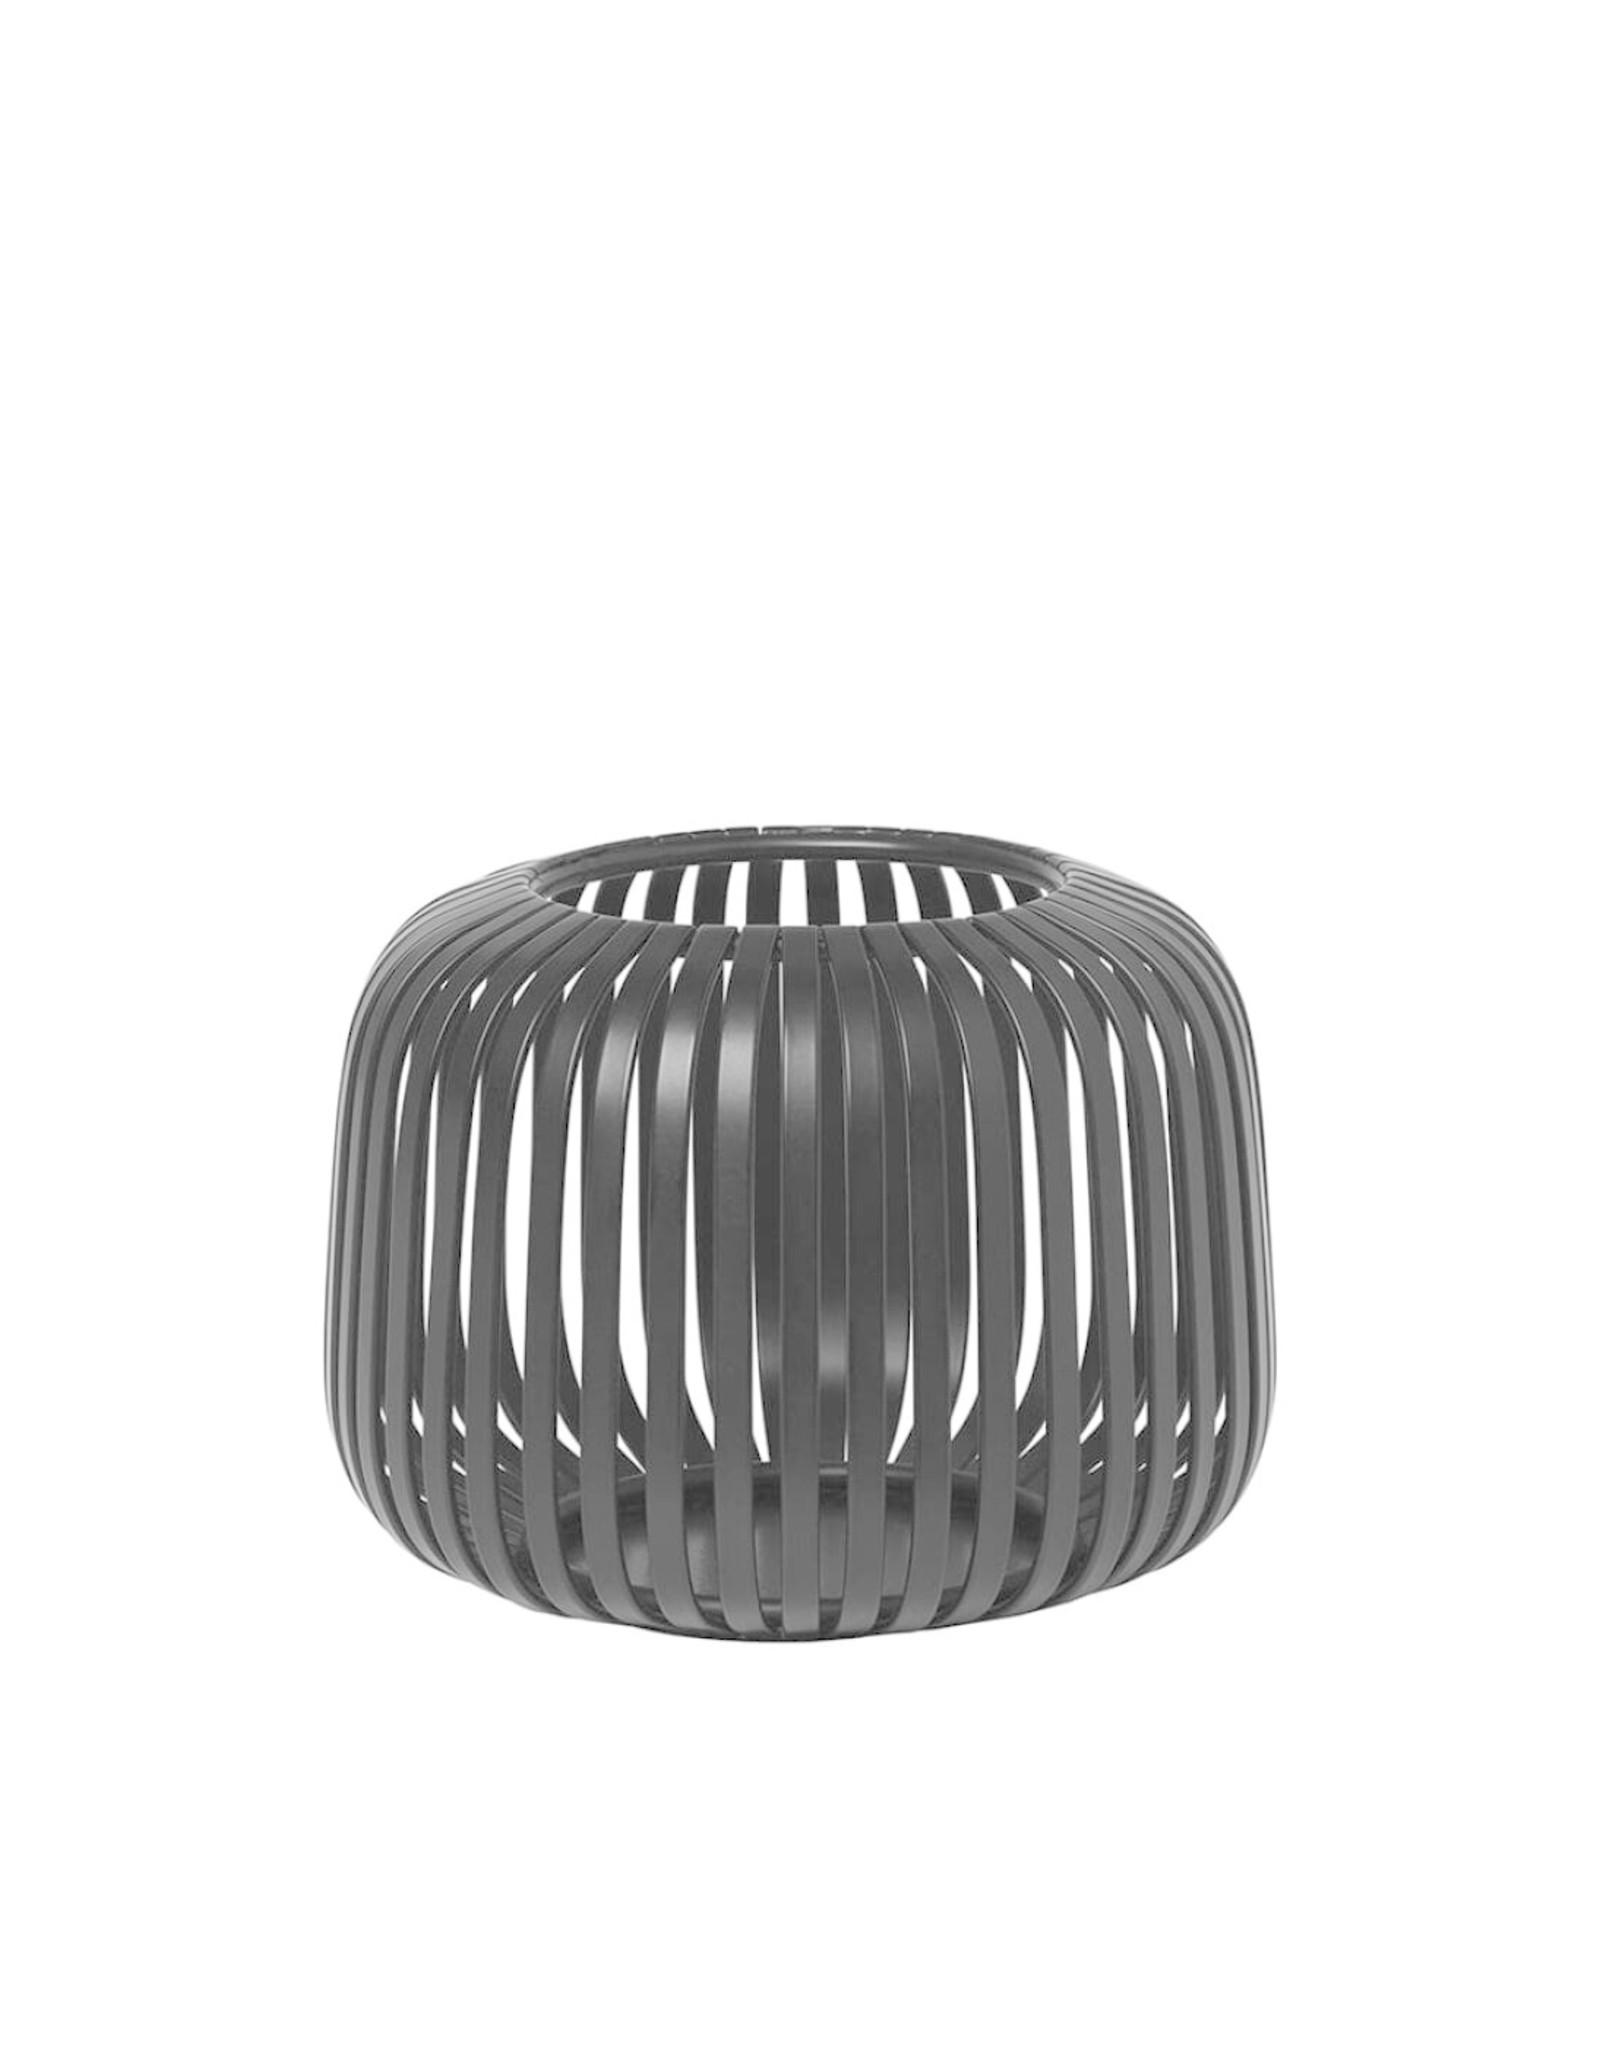 Blomus BLOMUS - LITO windlicht / lantaarn Zwart staal Ø13,5cm Extra Small